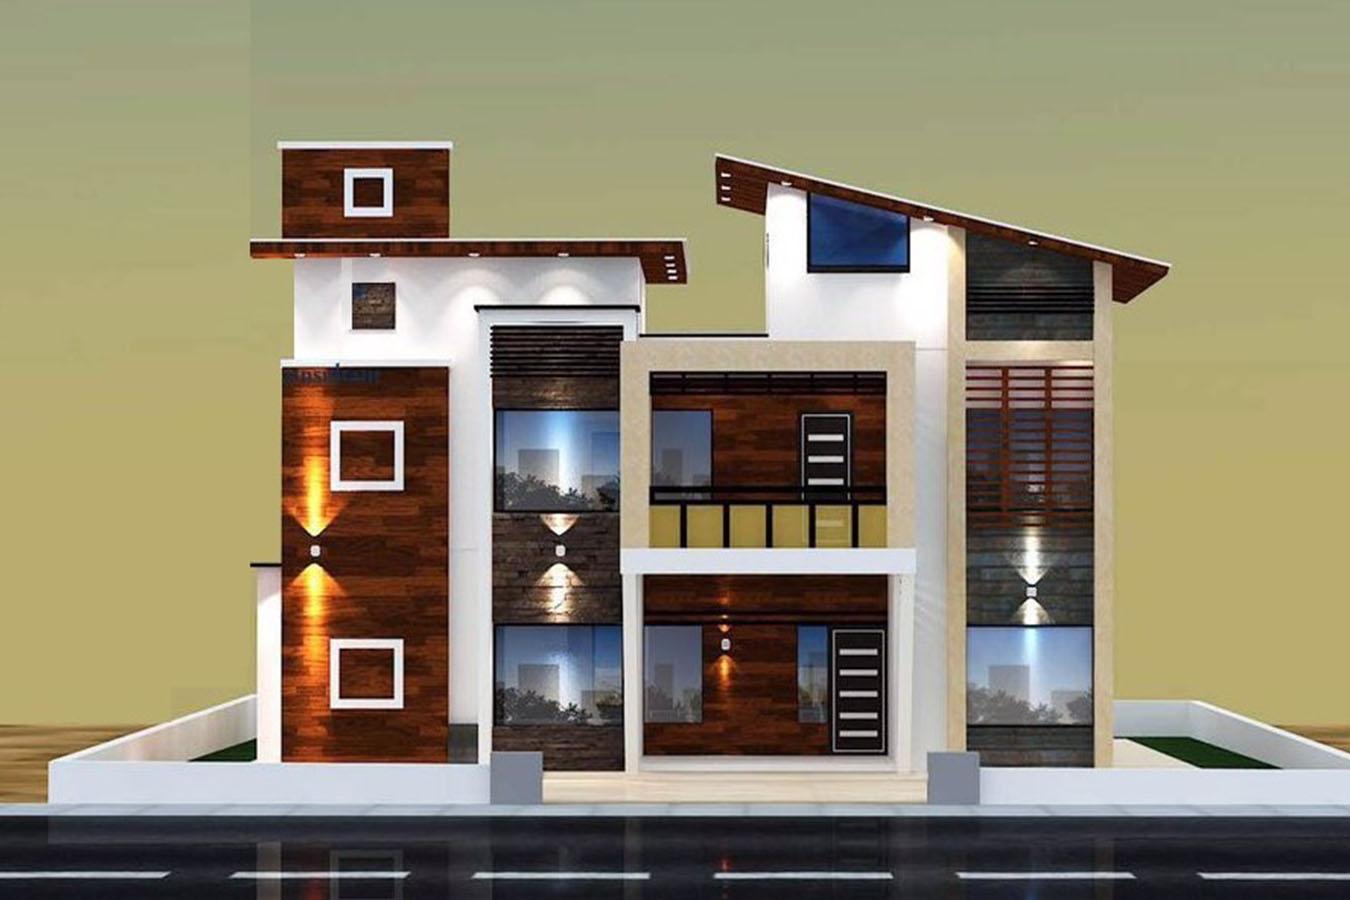 Building Construction Architect Inteior Designer